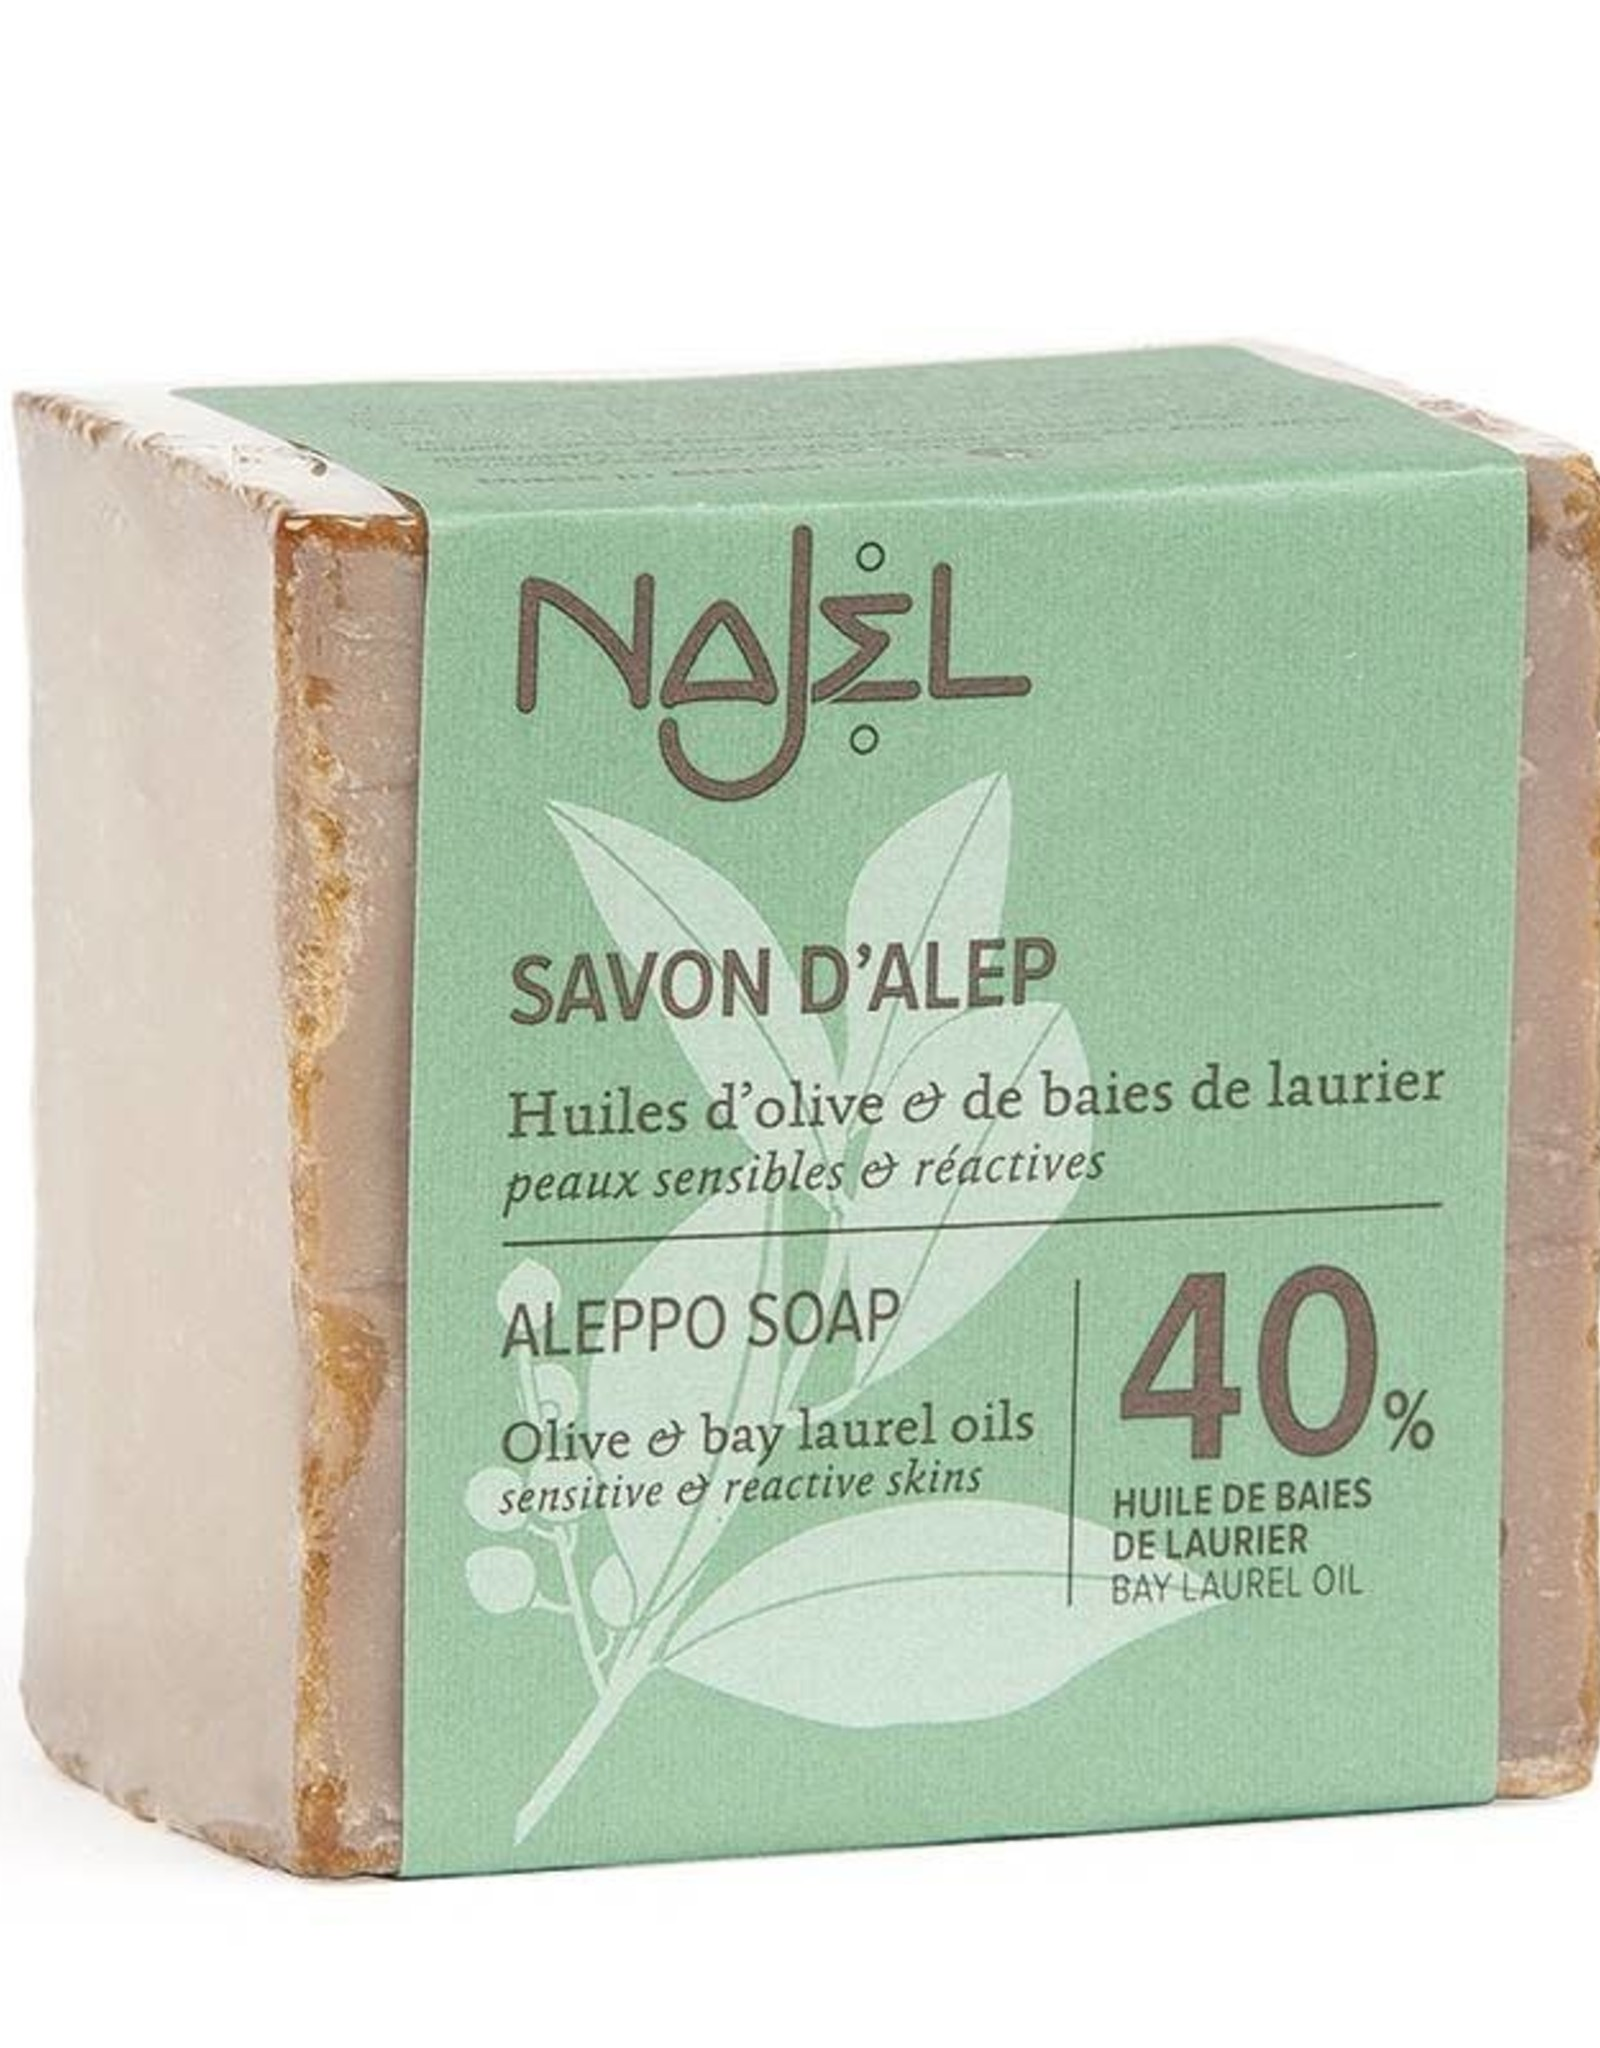 Najel Aleppo zeep laurier olie 40% sensitive & reactive skin 100 g